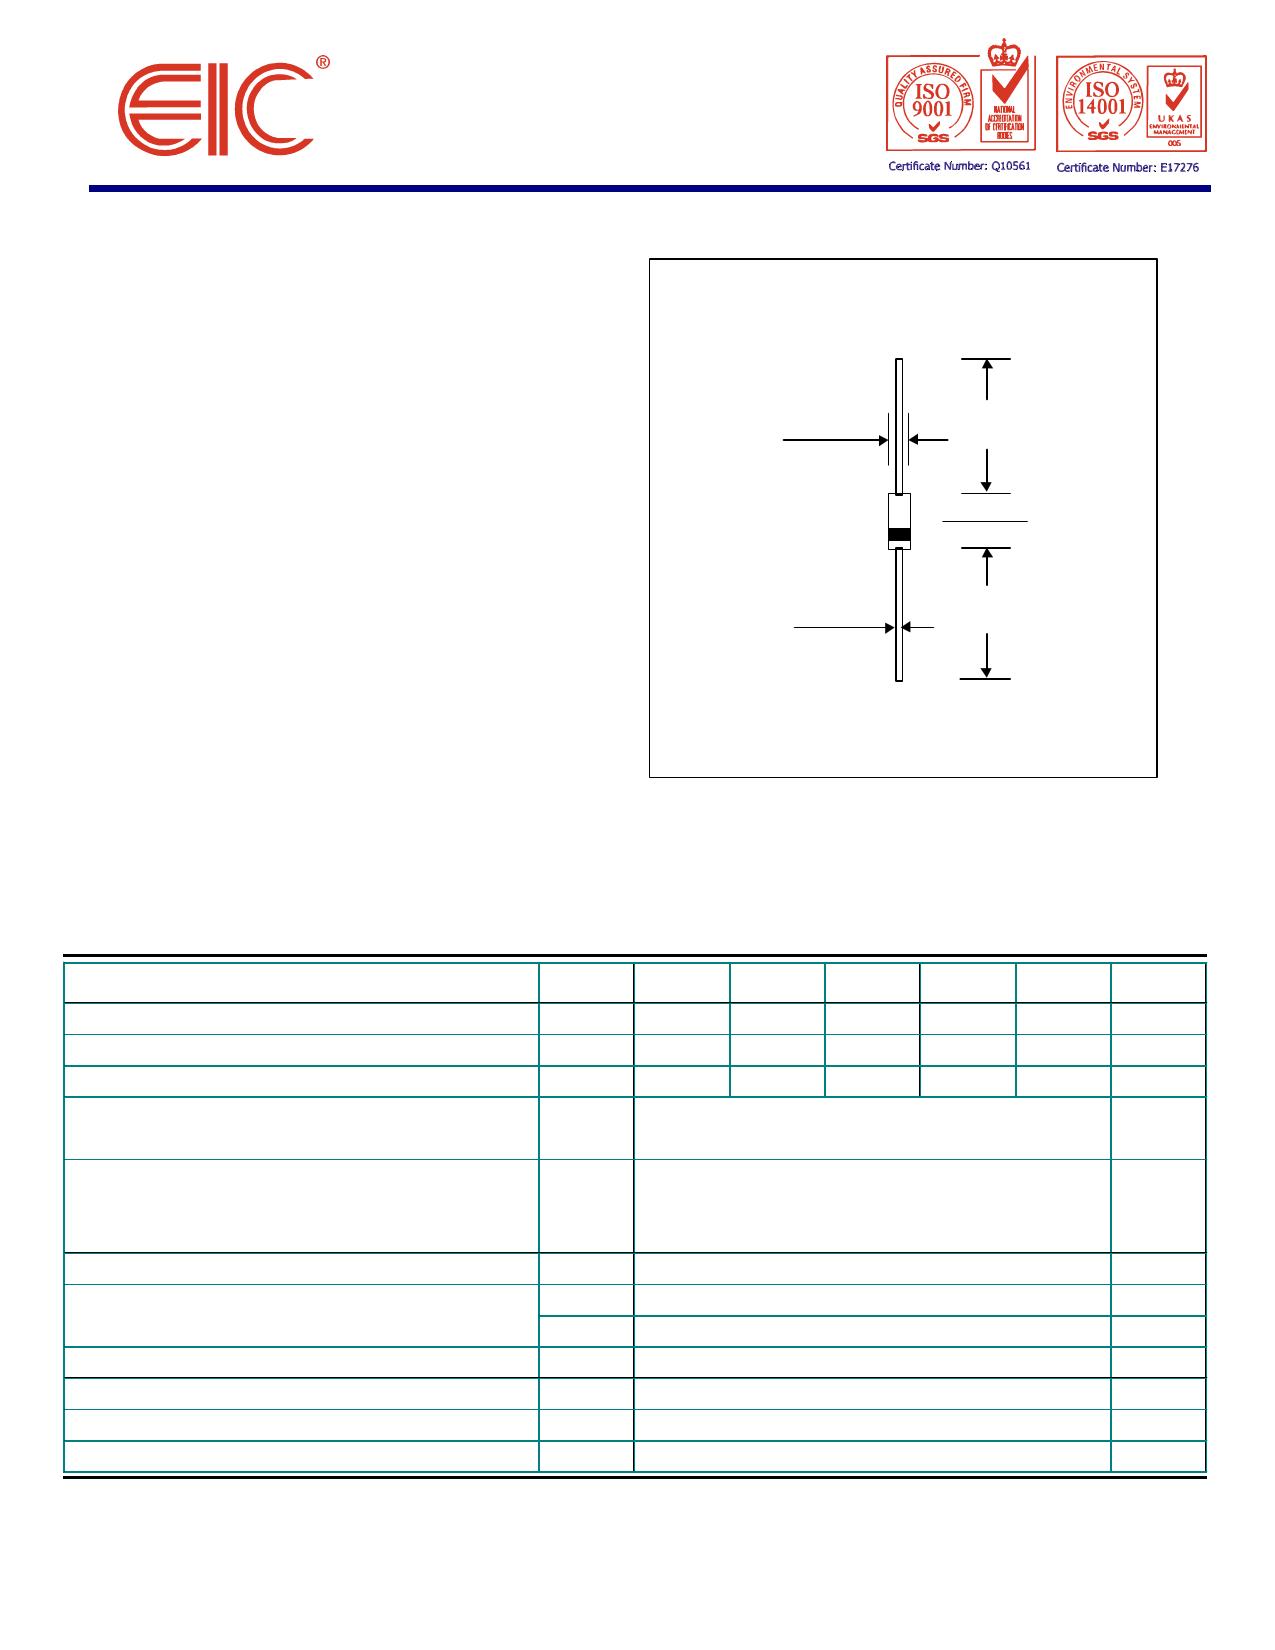 RM2Z datasheet